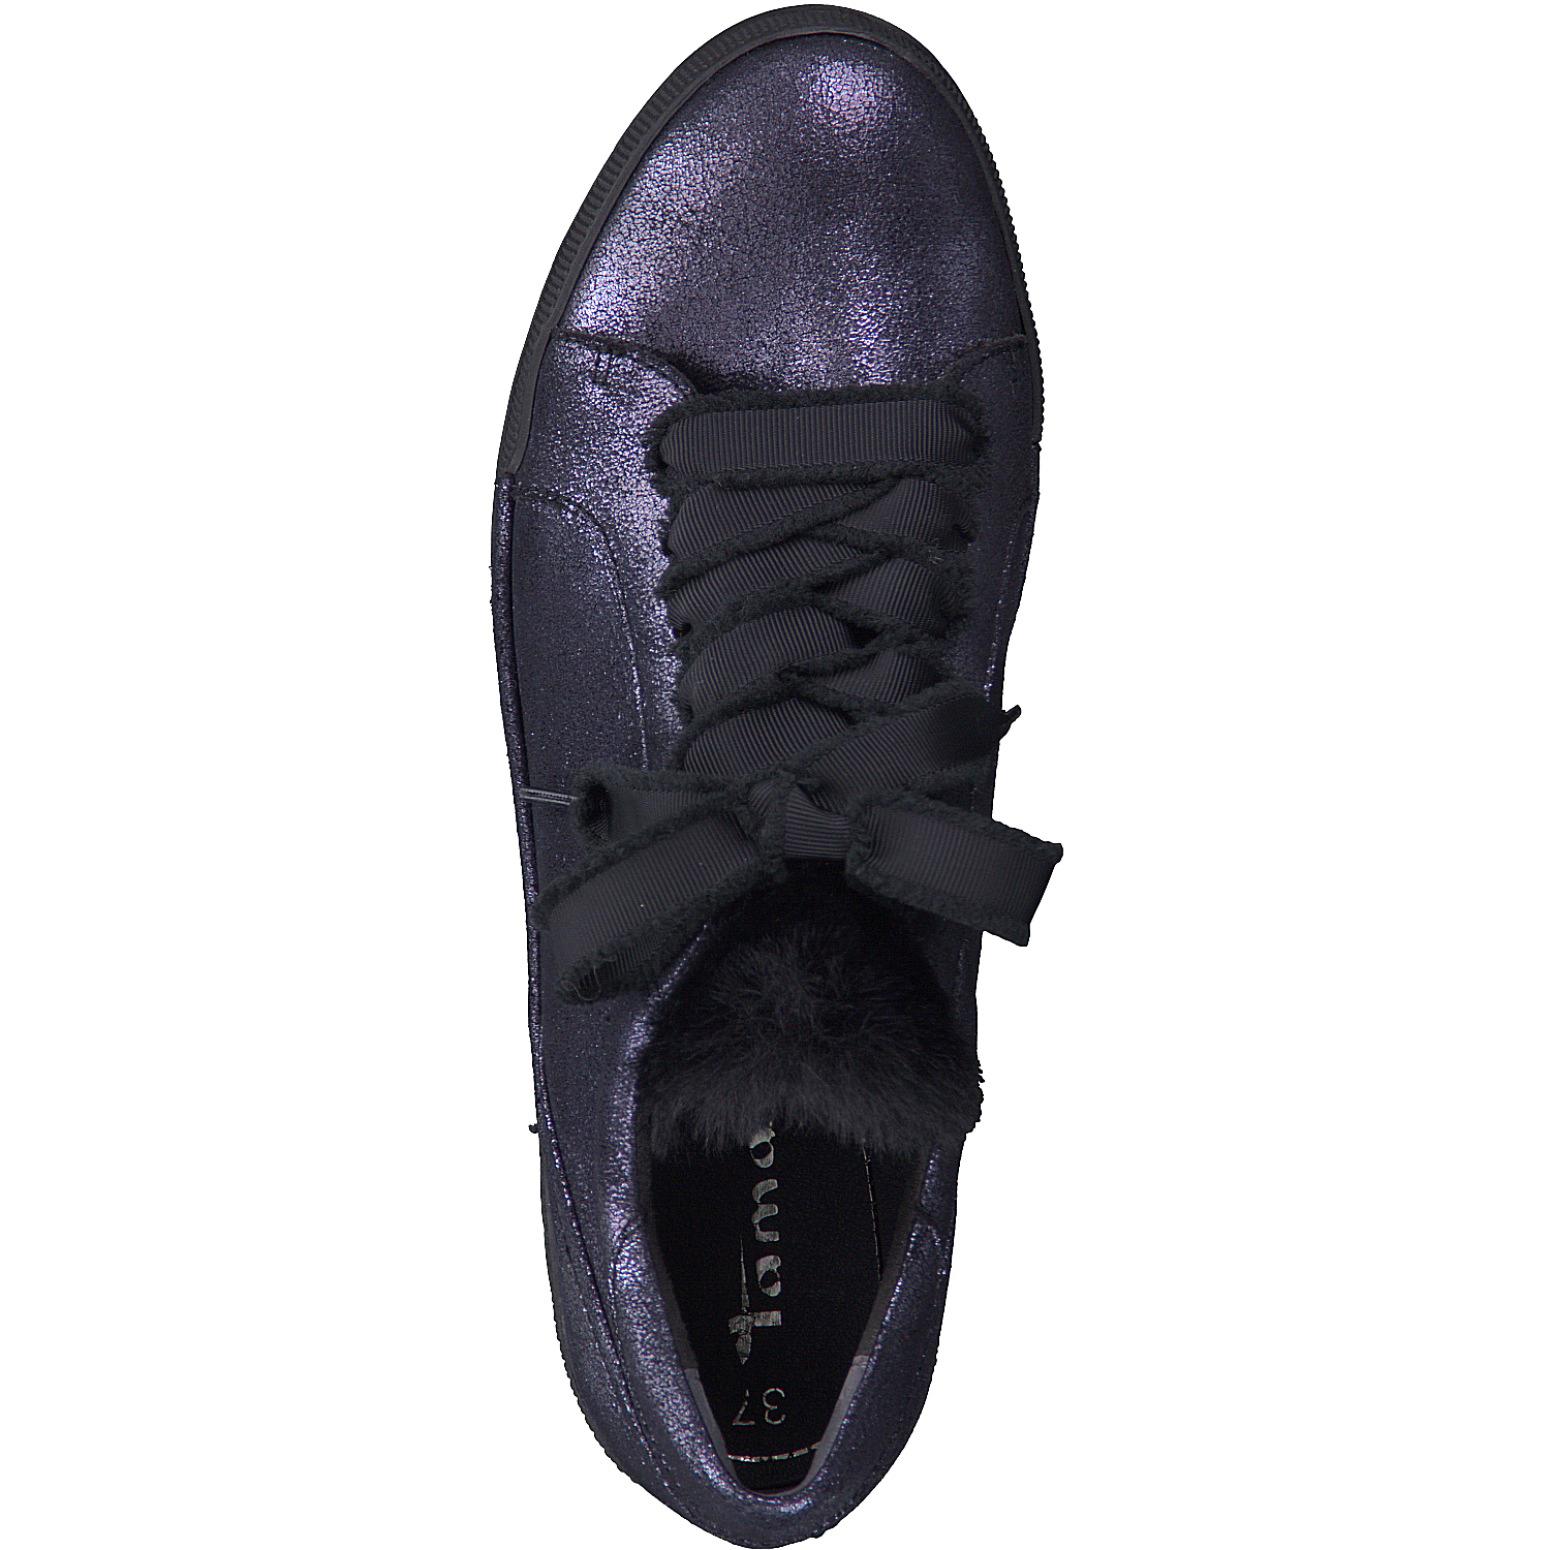 8ccb93ff322 Sneakersy Tamaris 1-1-23726-21 824 NAVY METALLIC